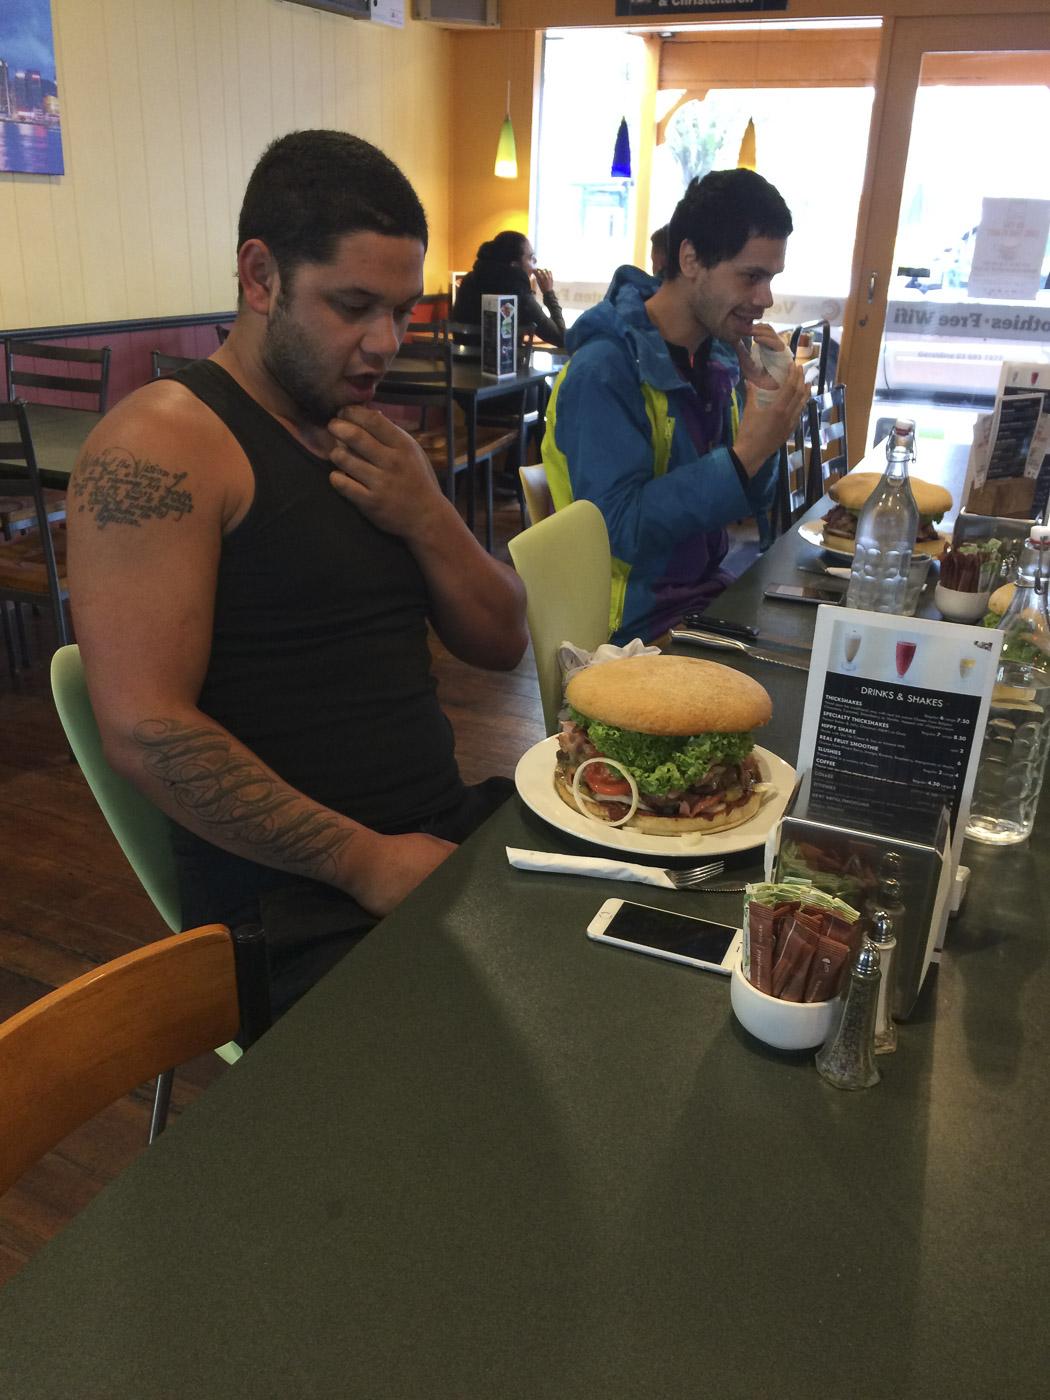 2Kg burger - free if you finish it